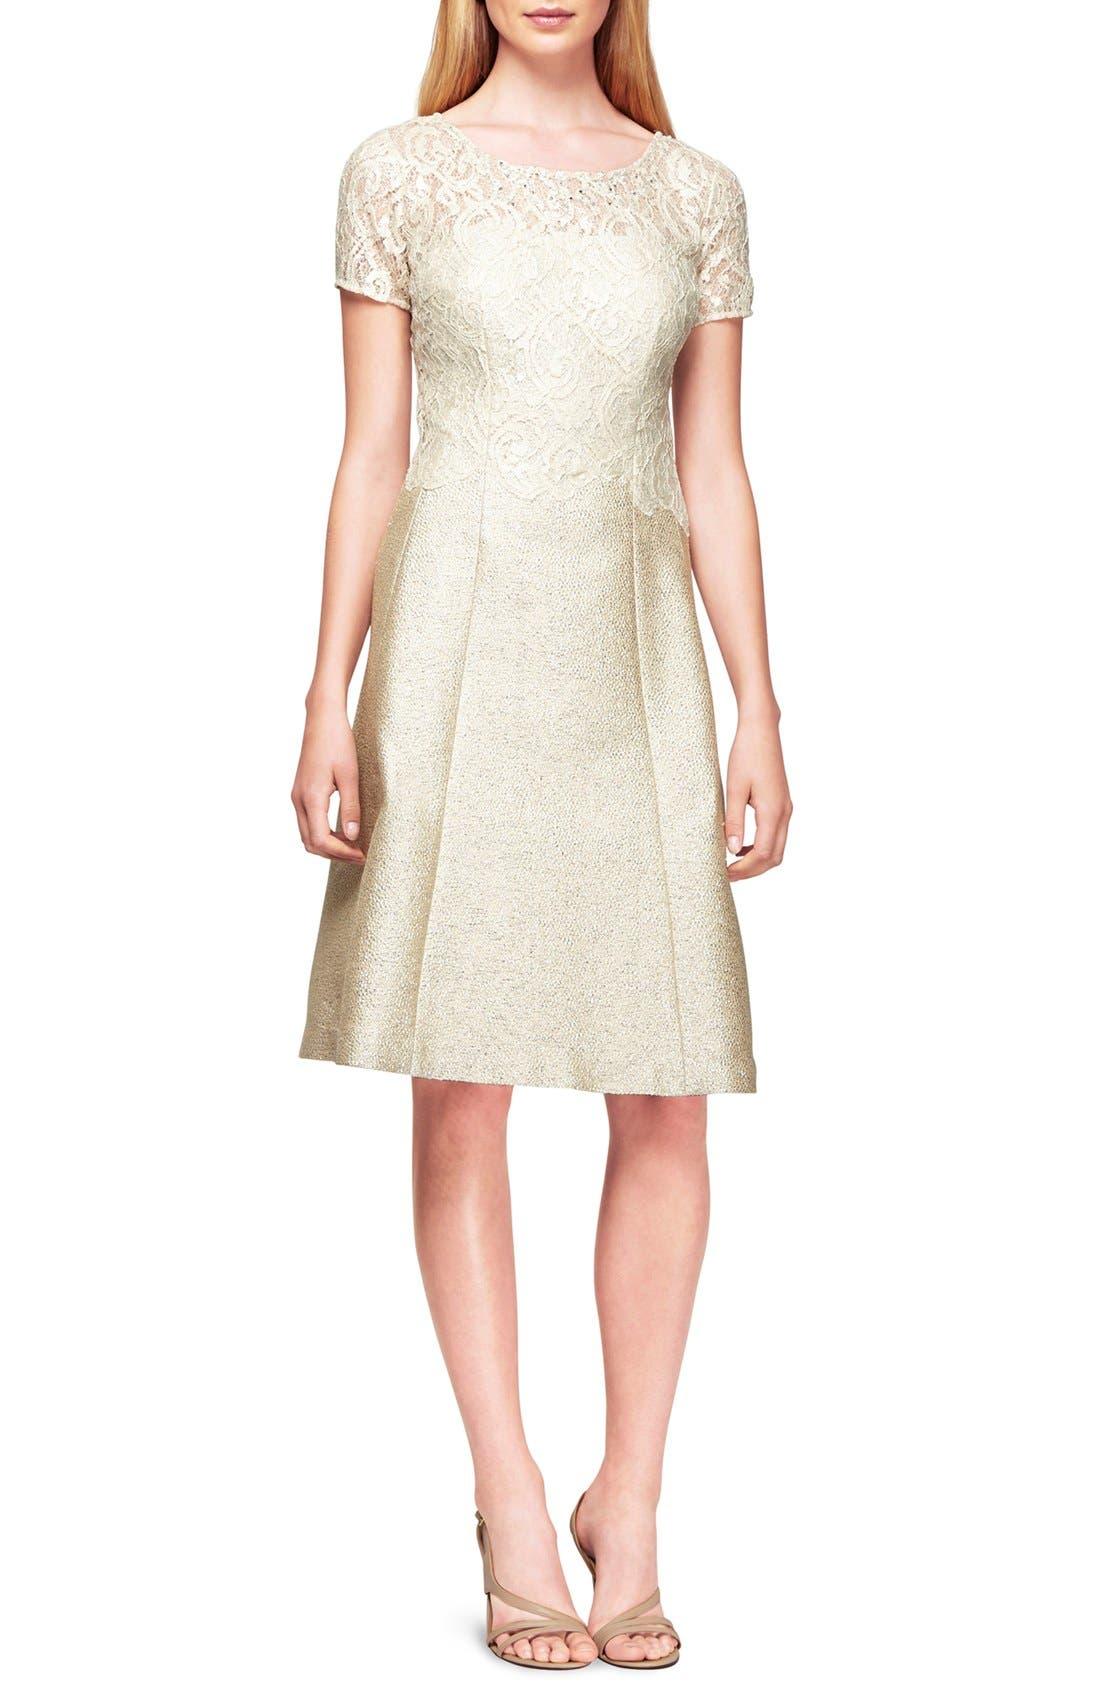 Main Image - Kay Unger Lace Jacquard Fit & Flare Dress